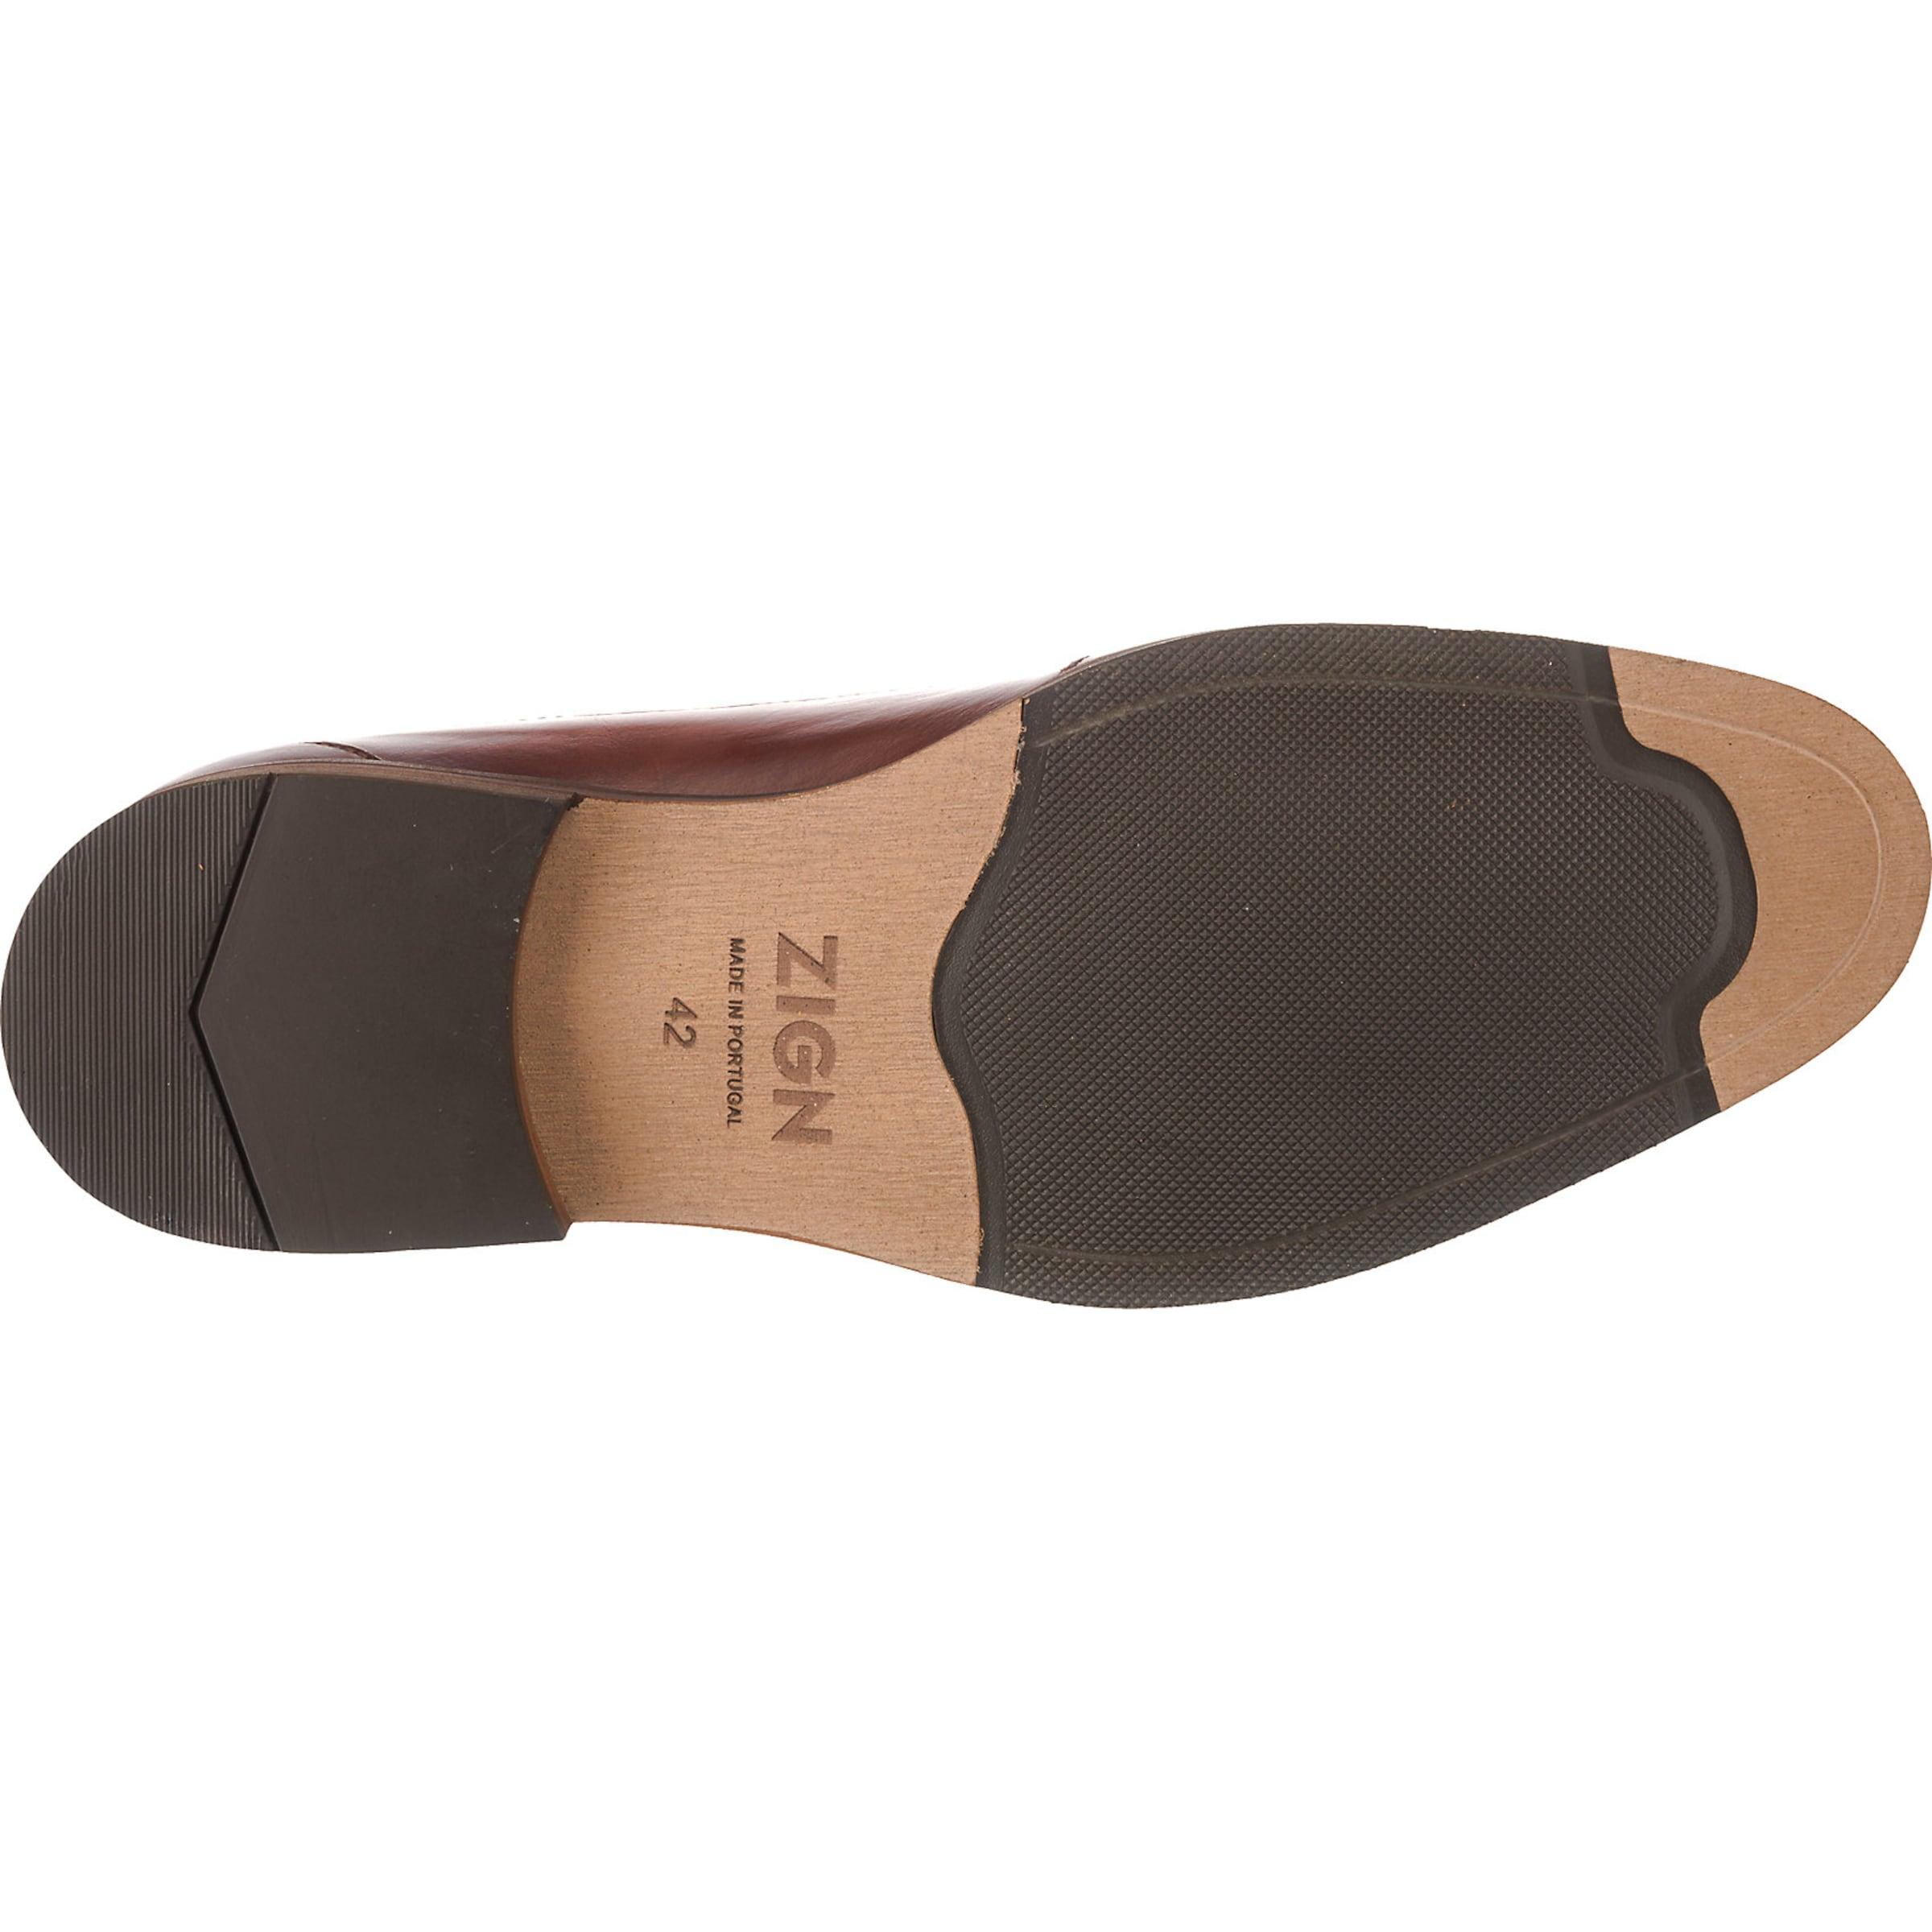 Zign Zign Zign Schuhe '2215 Leder Billige Herren- und Damenschuhe cd496e